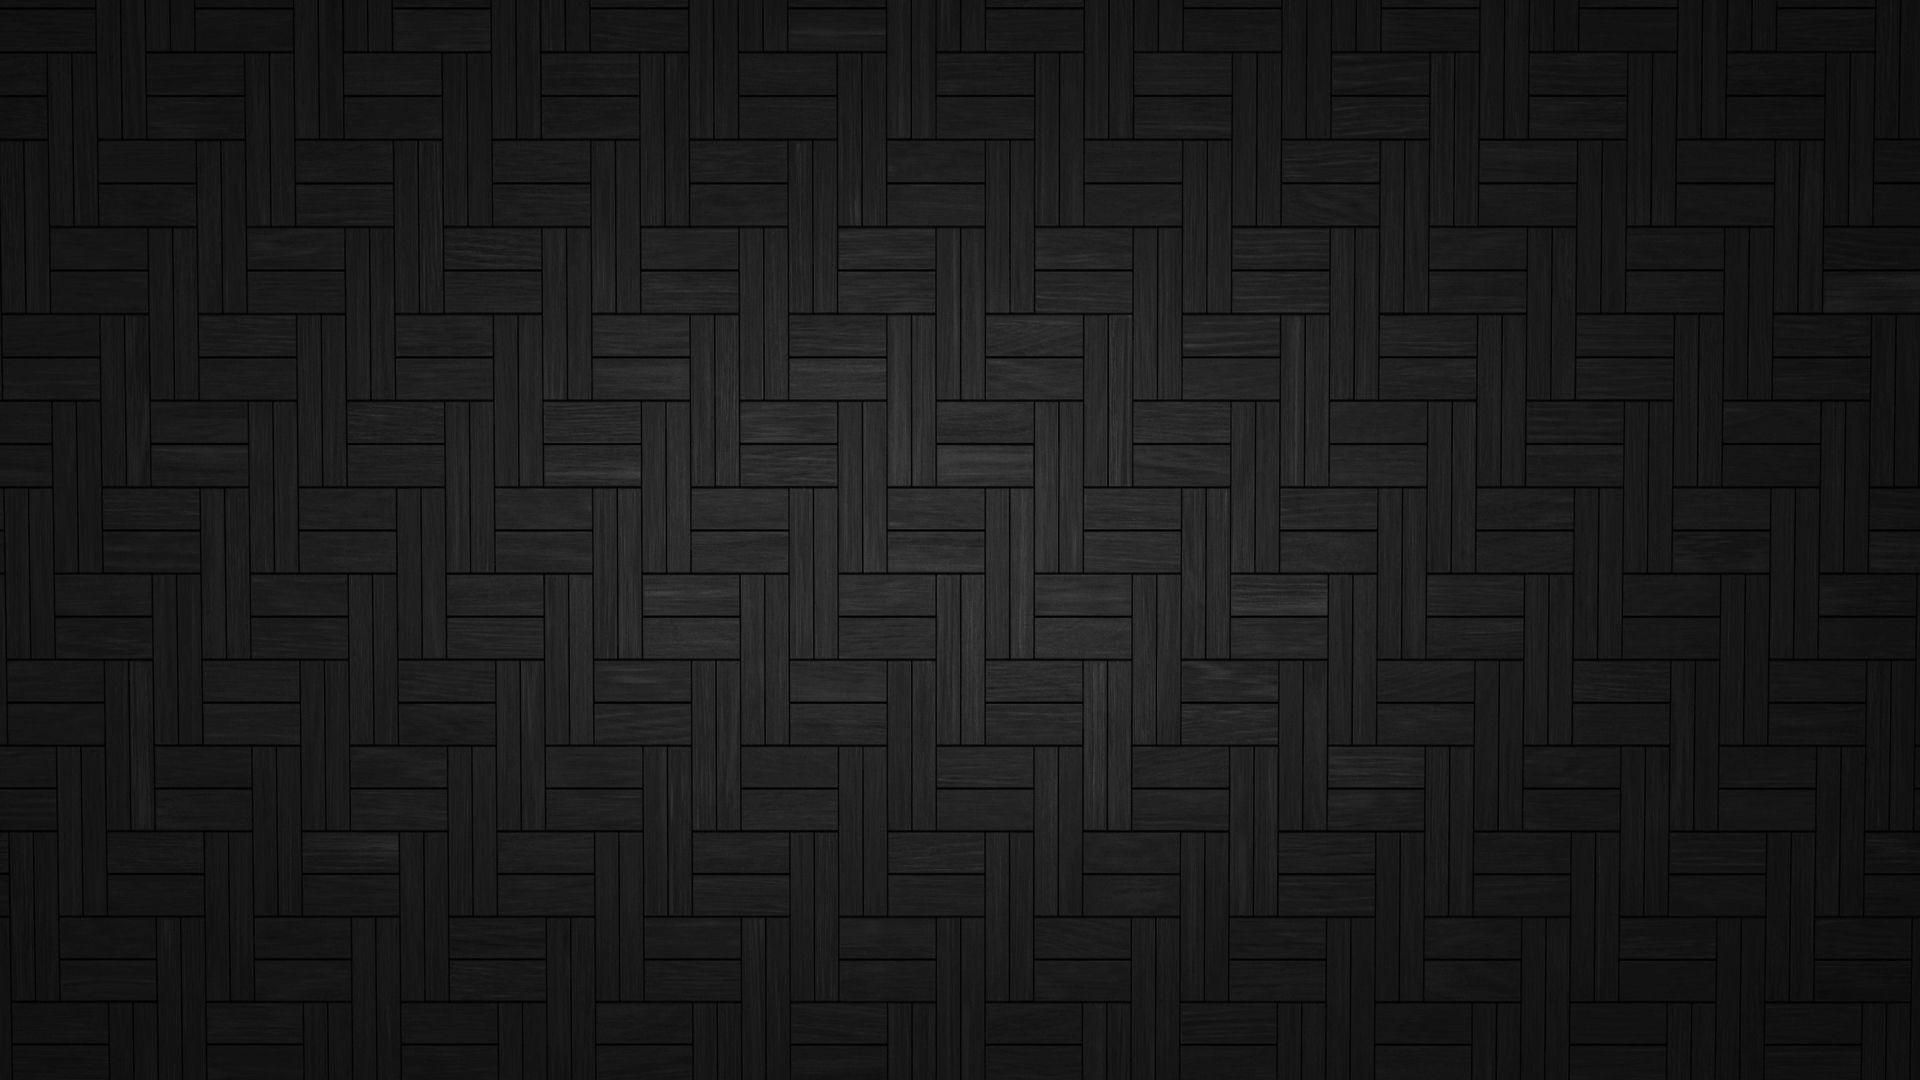 Res: 1920x1080, Full HD 1080p Dark Wallpapers HD, Desktop Backgrounds